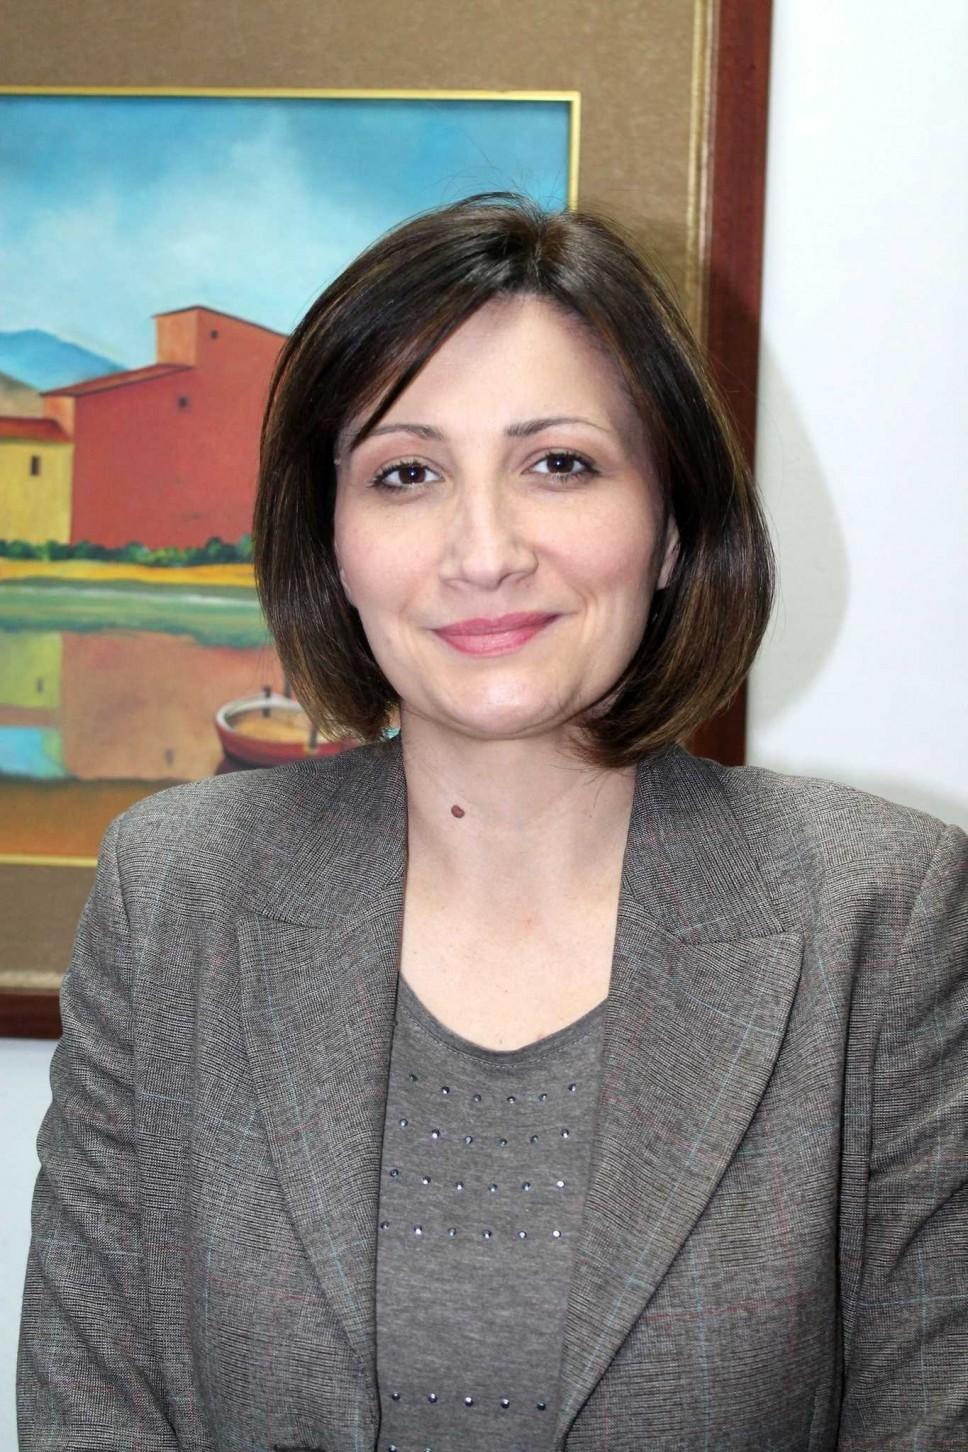 Biografija - Laković Tanja